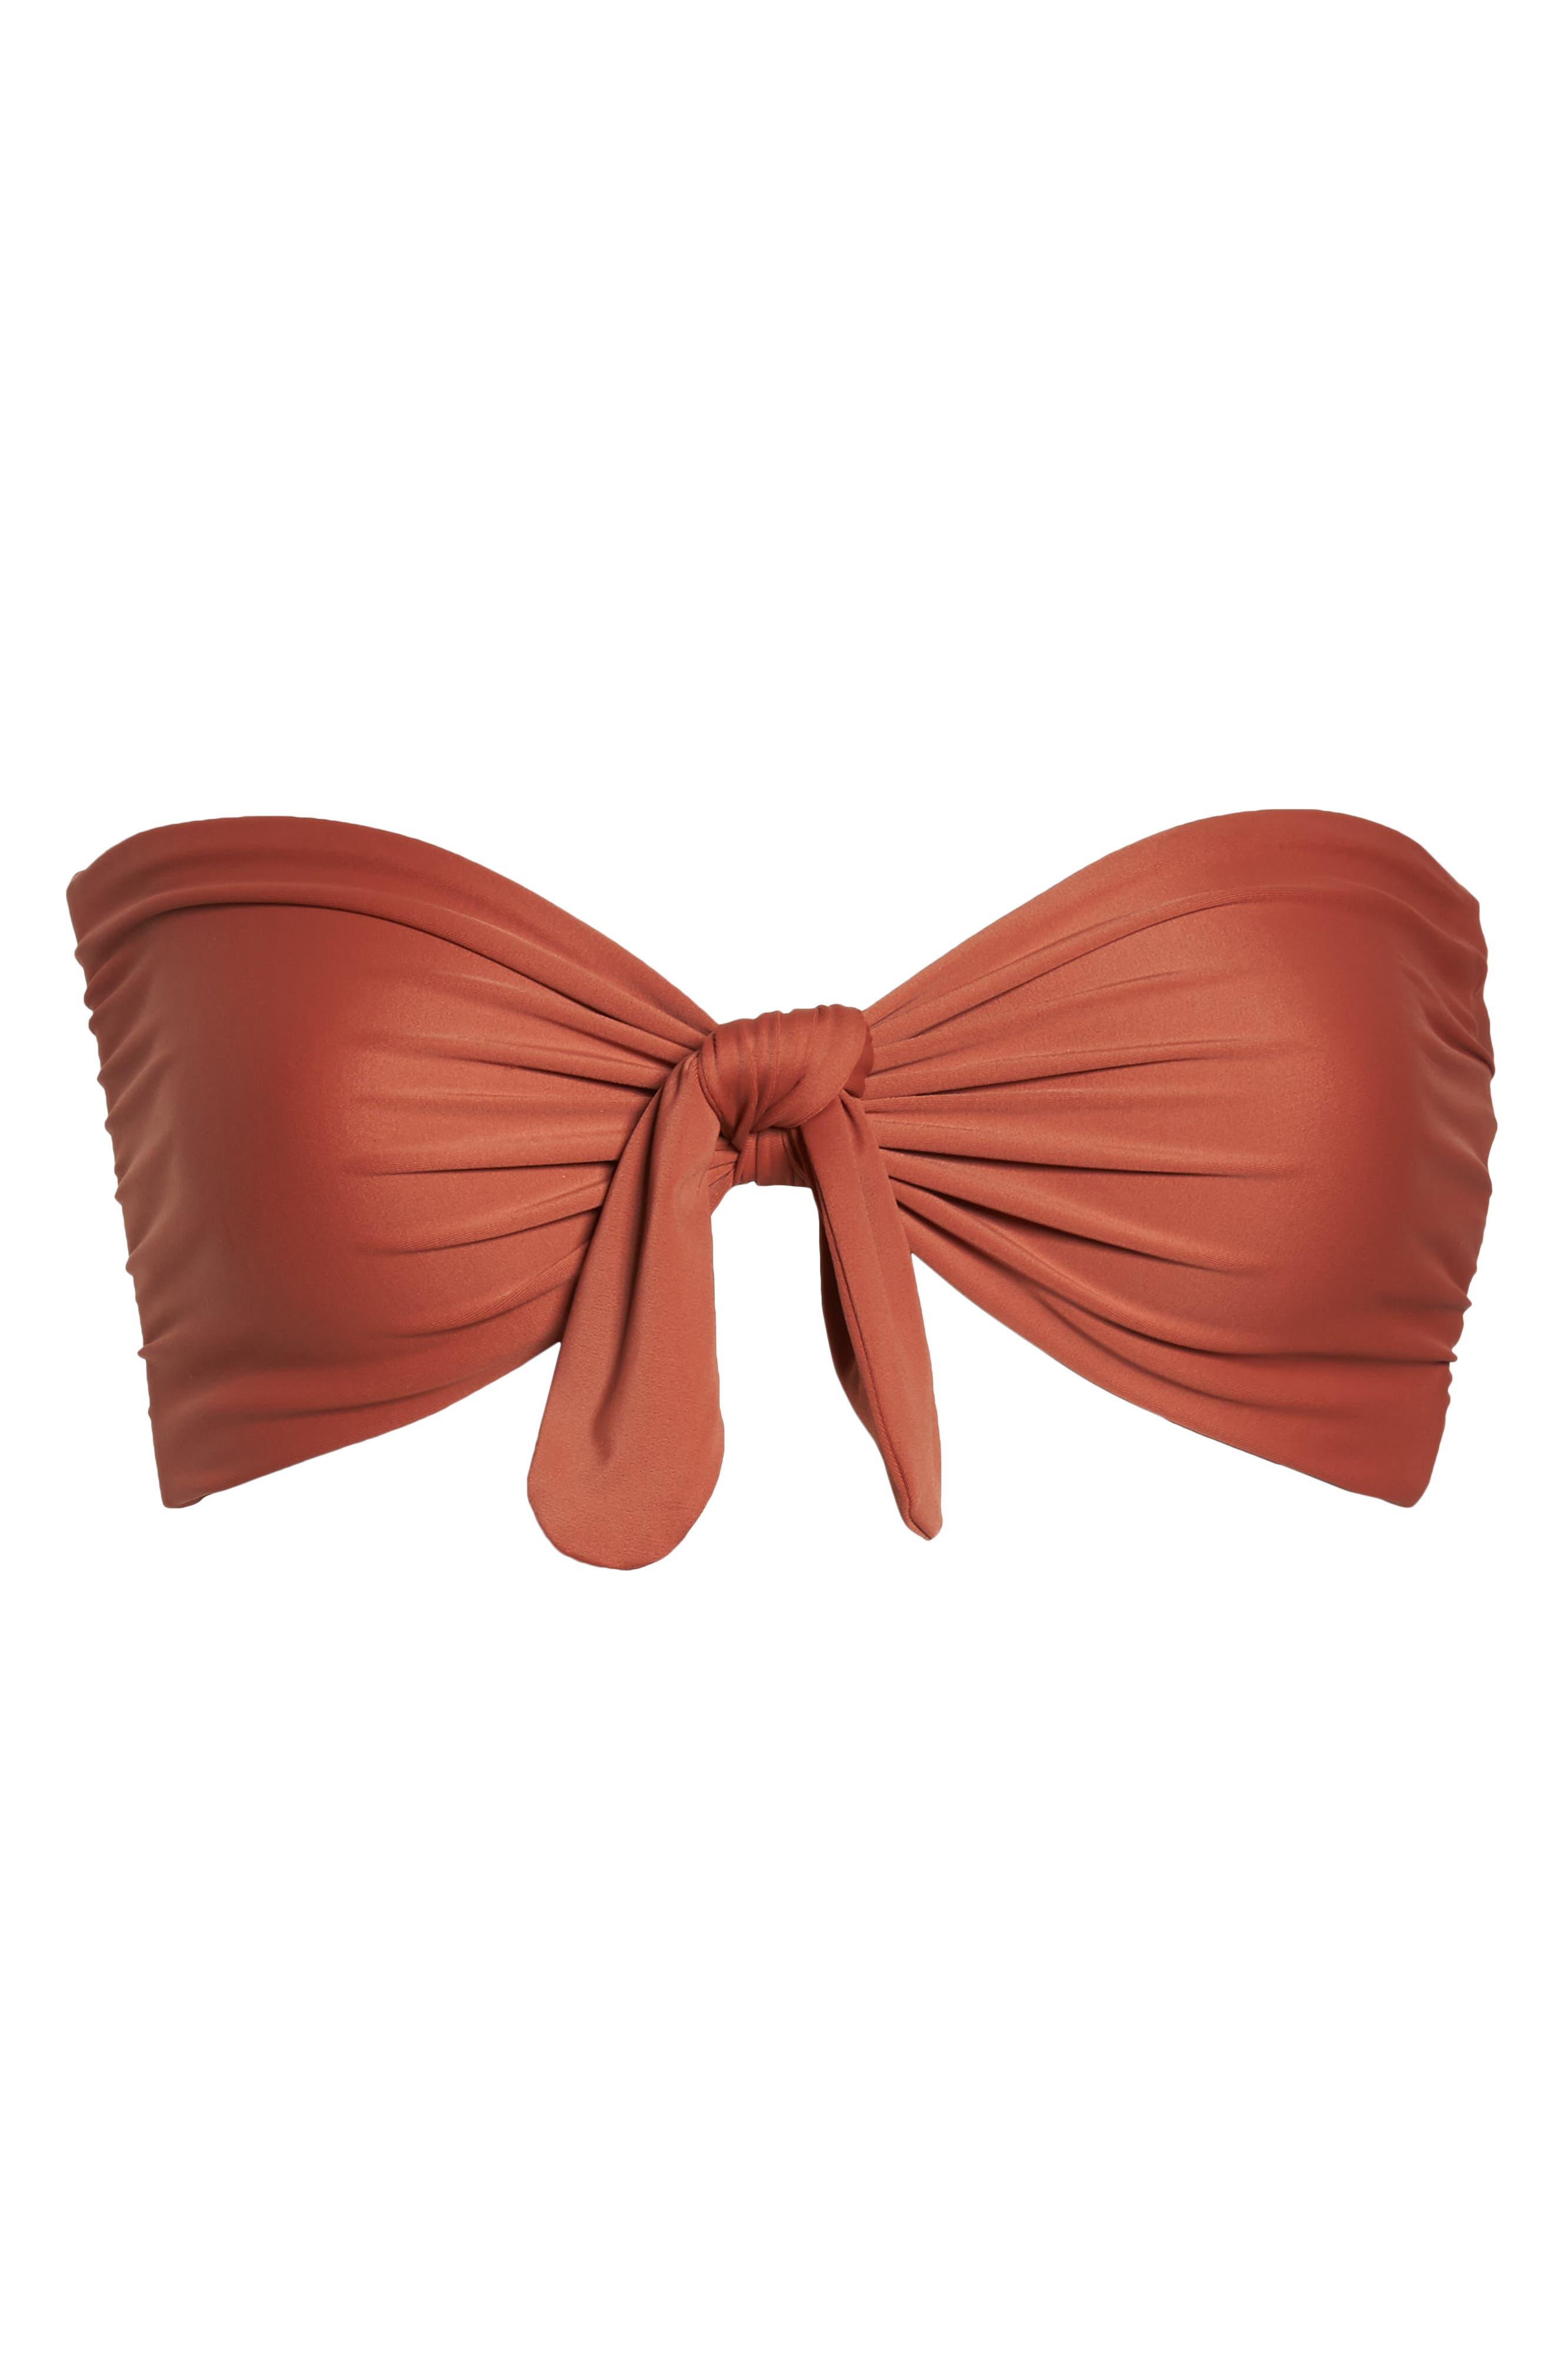 Fairfax Bandeau Bikini Top,                             Alternate thumbnail 9, color,                             Copper